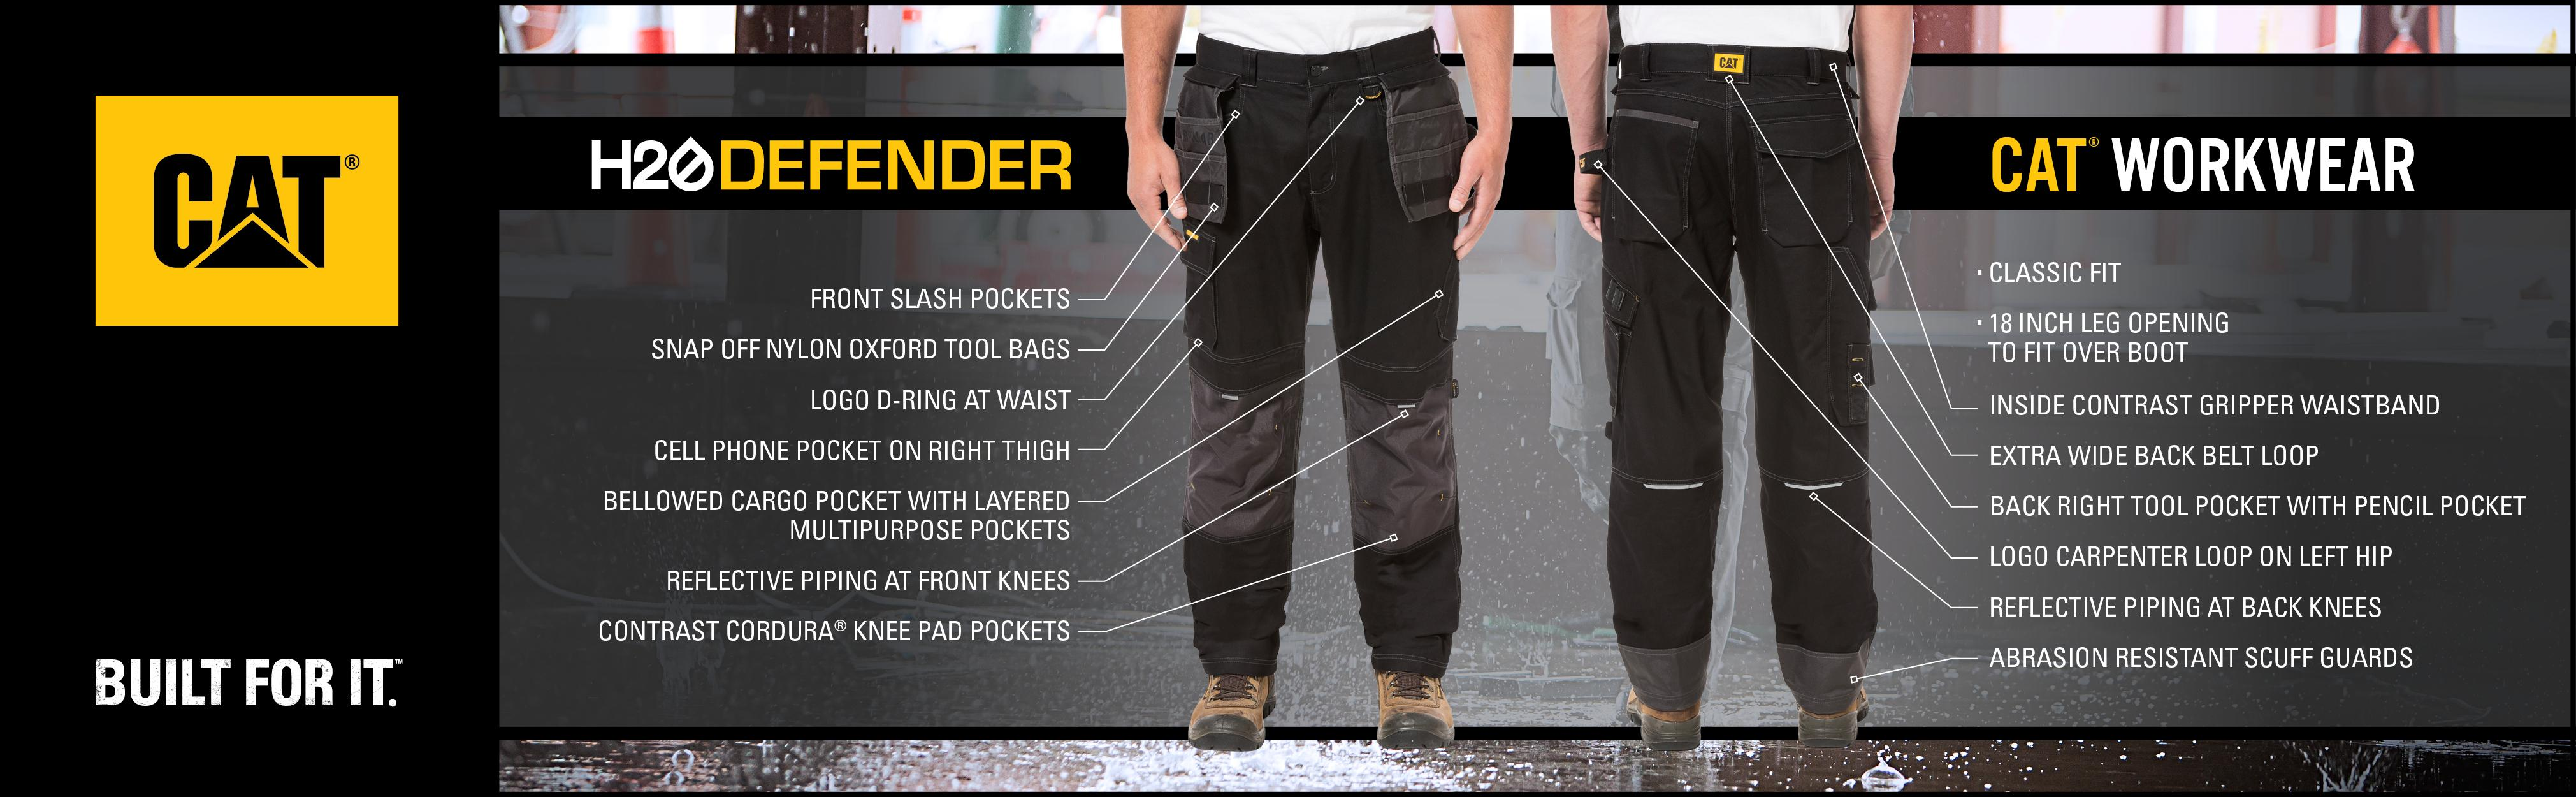 cat caterpillar carhartt dickies pant water resistant stretch fabric  reflective knee pad workwear f404677f08